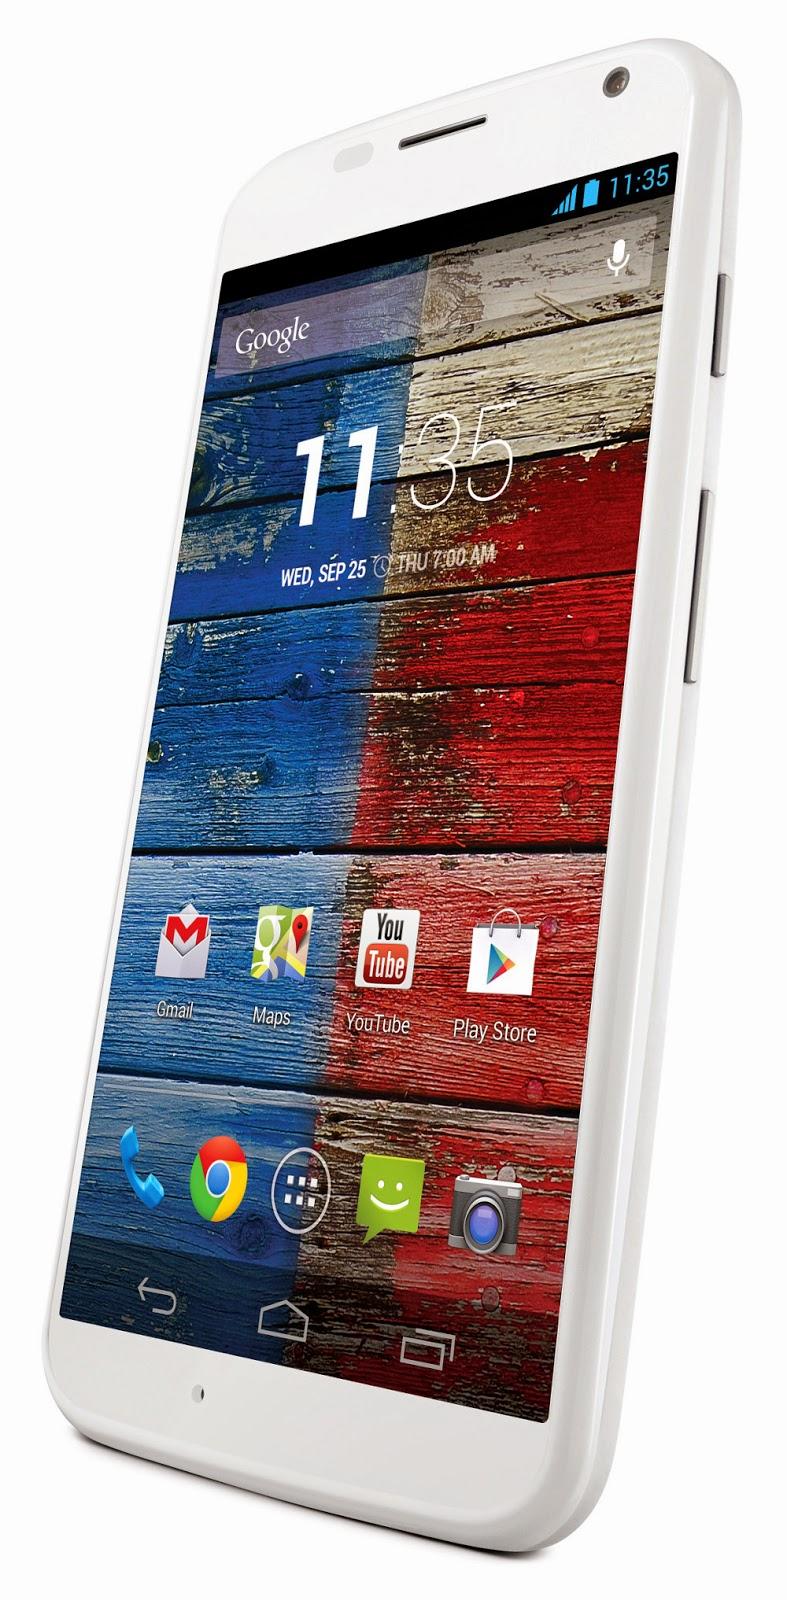 Motorola Moto X 1st Generation - Moto X 2013